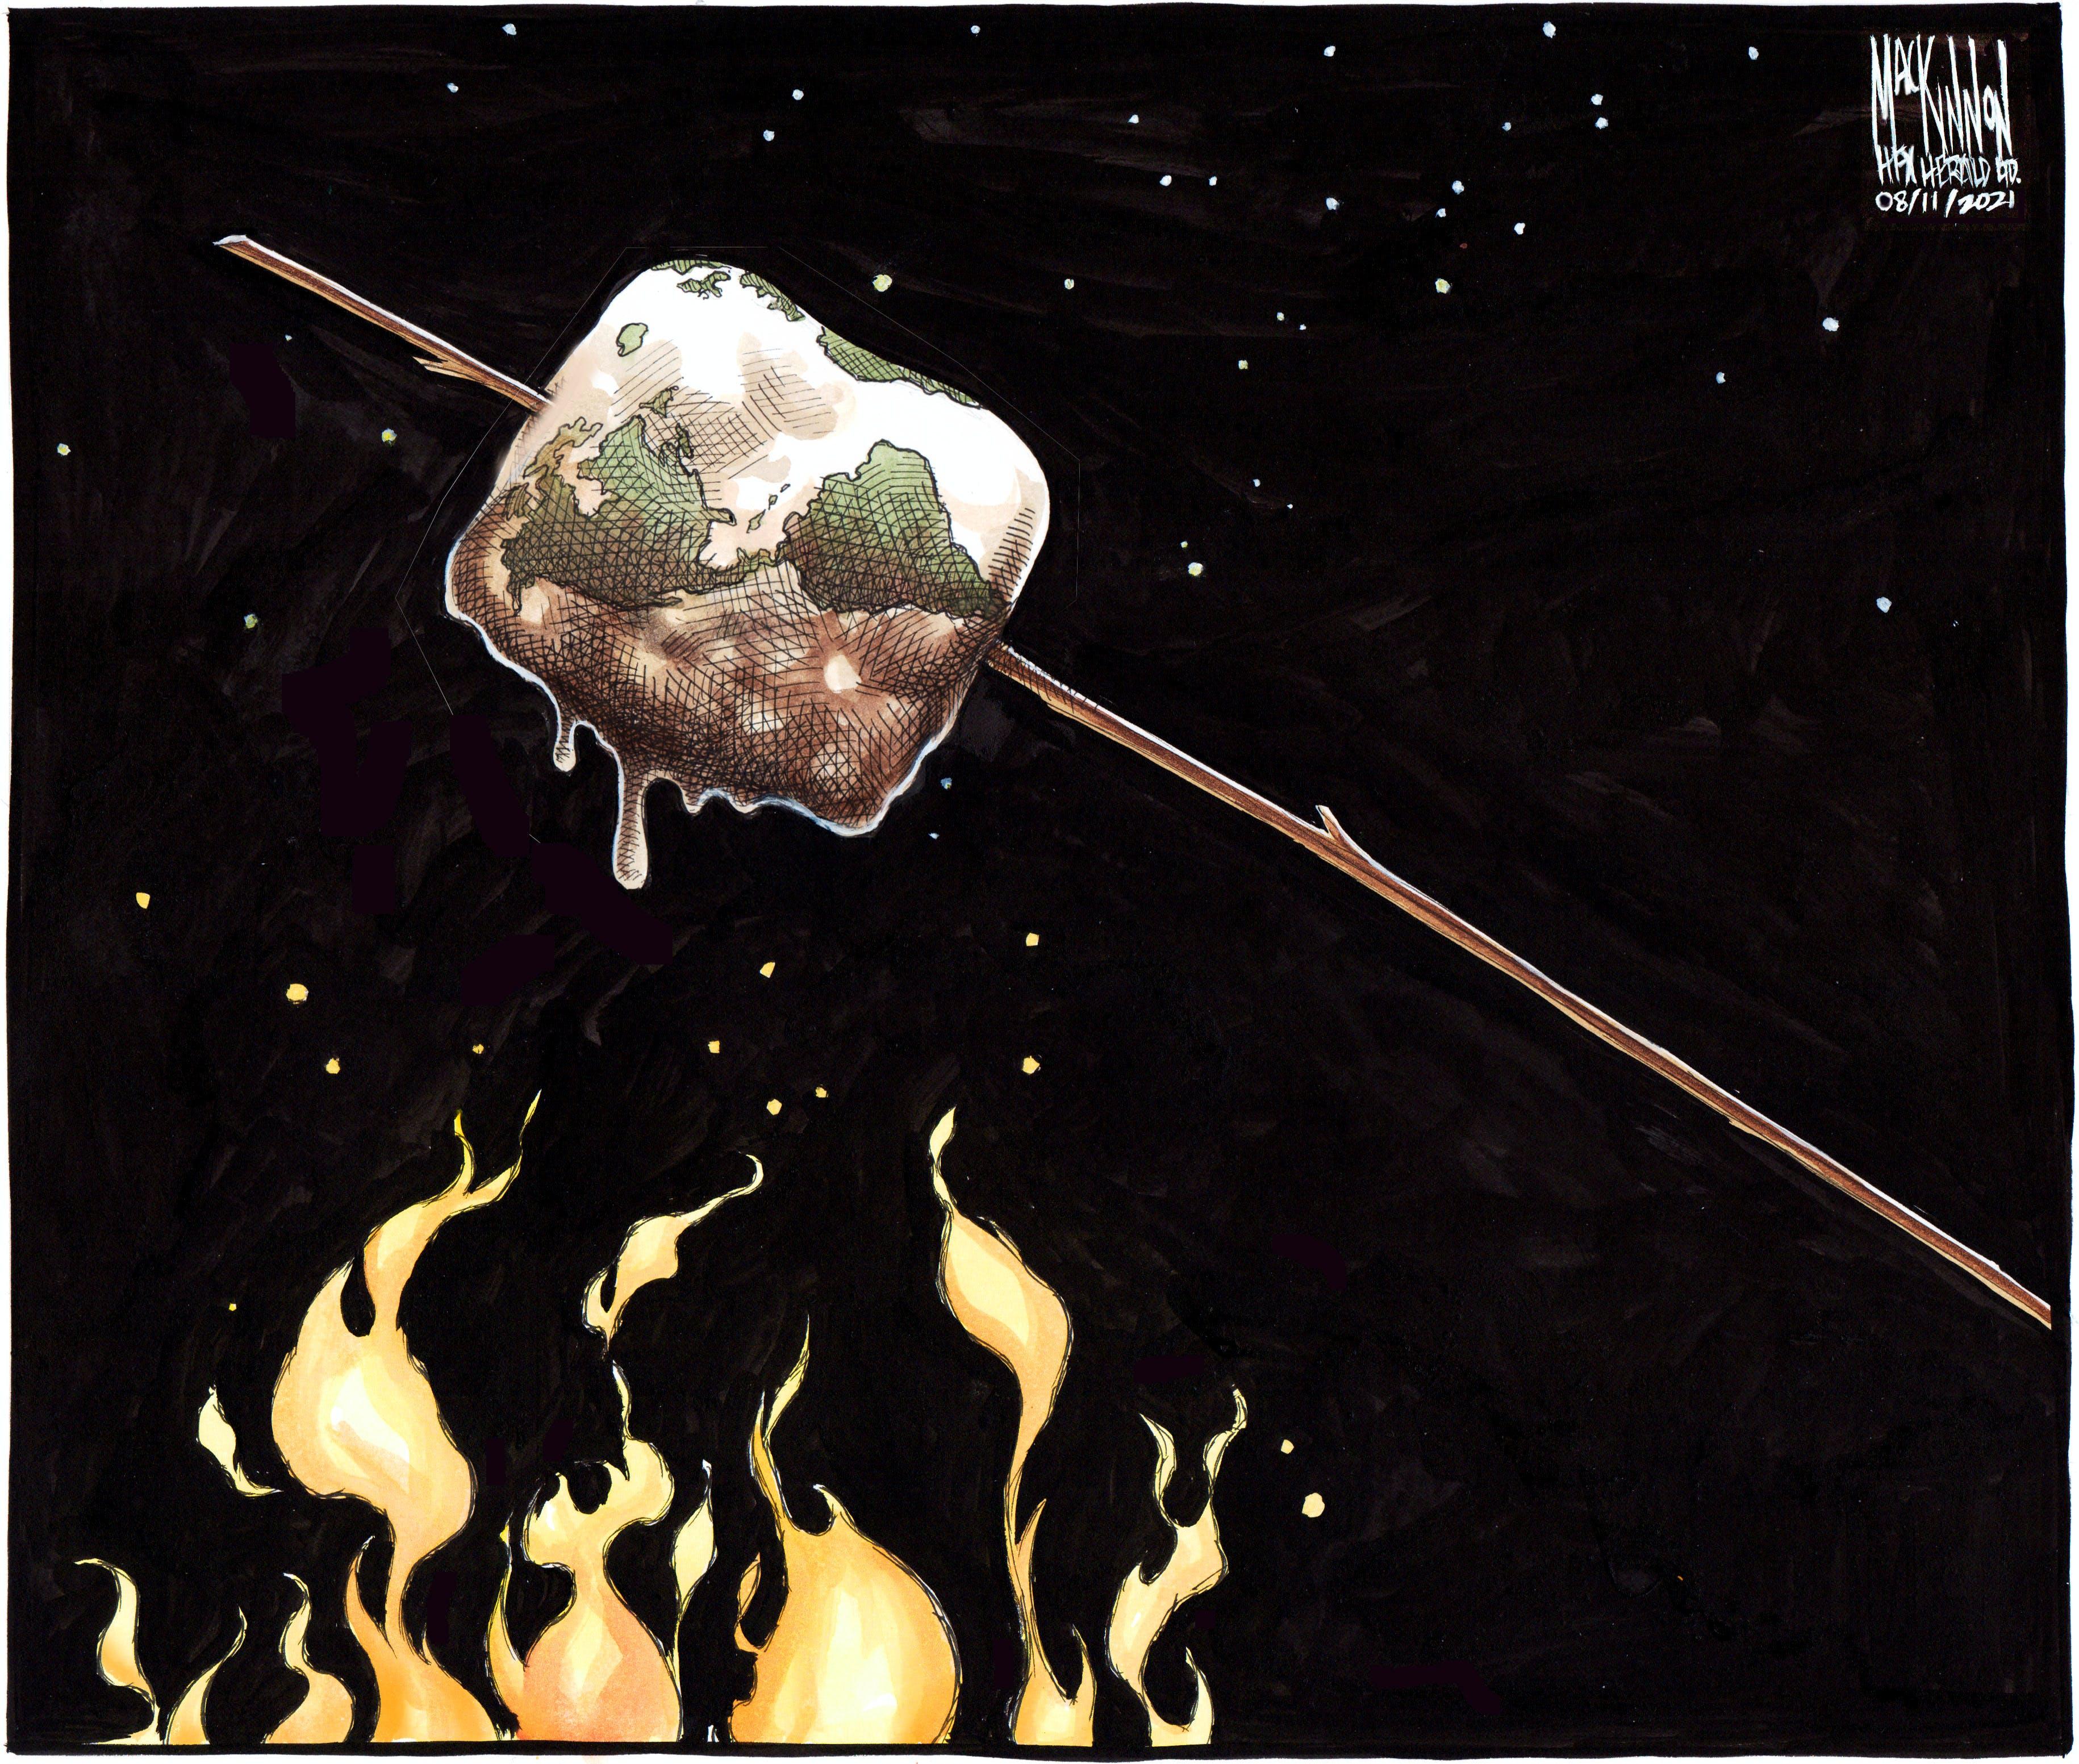 Bruce MacKinnon's editorial cartoon for August 11, 2021.